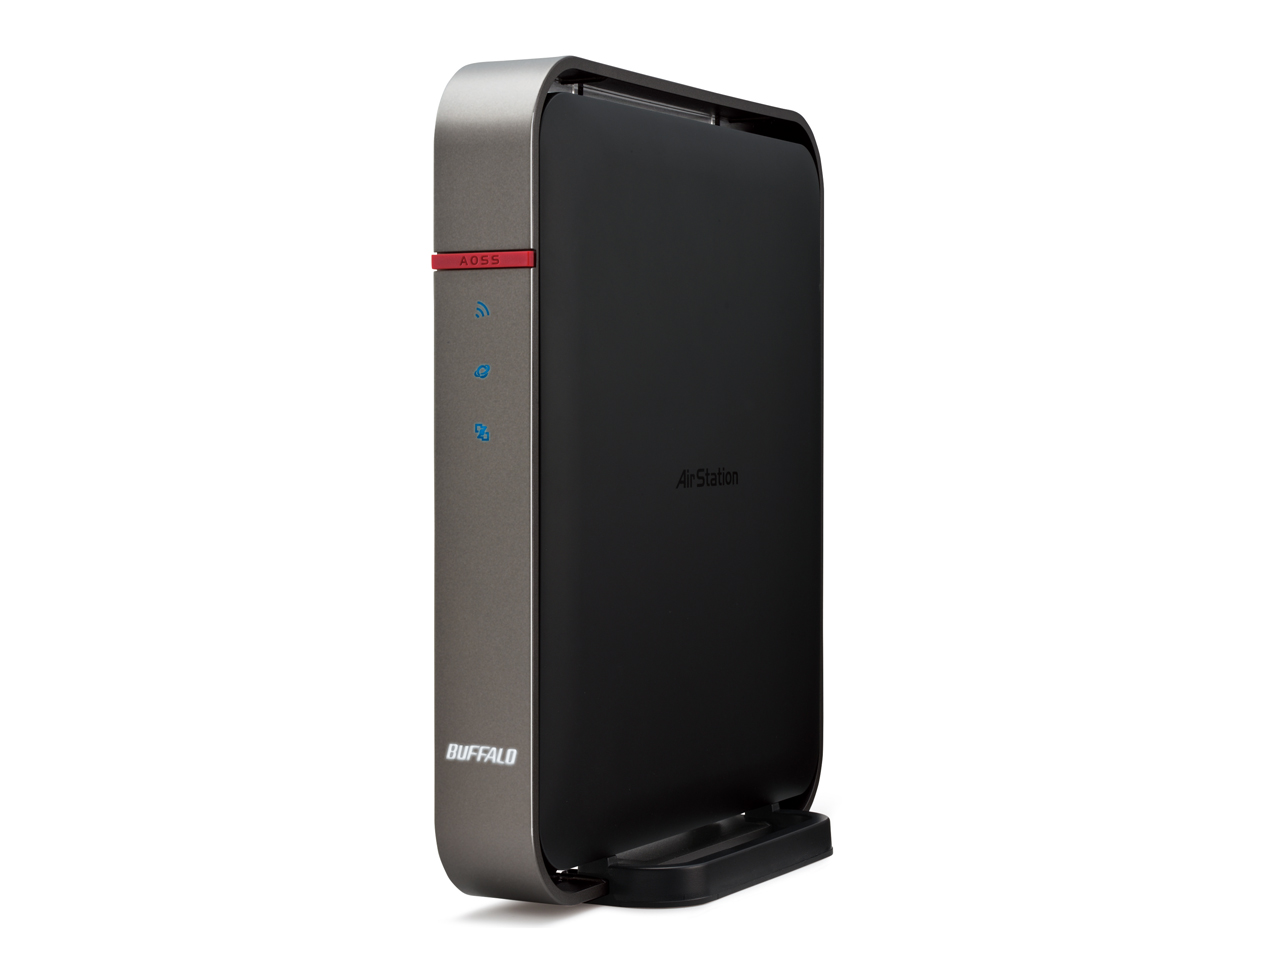 Wi-Fiルーター「WZR-1750DHP2」